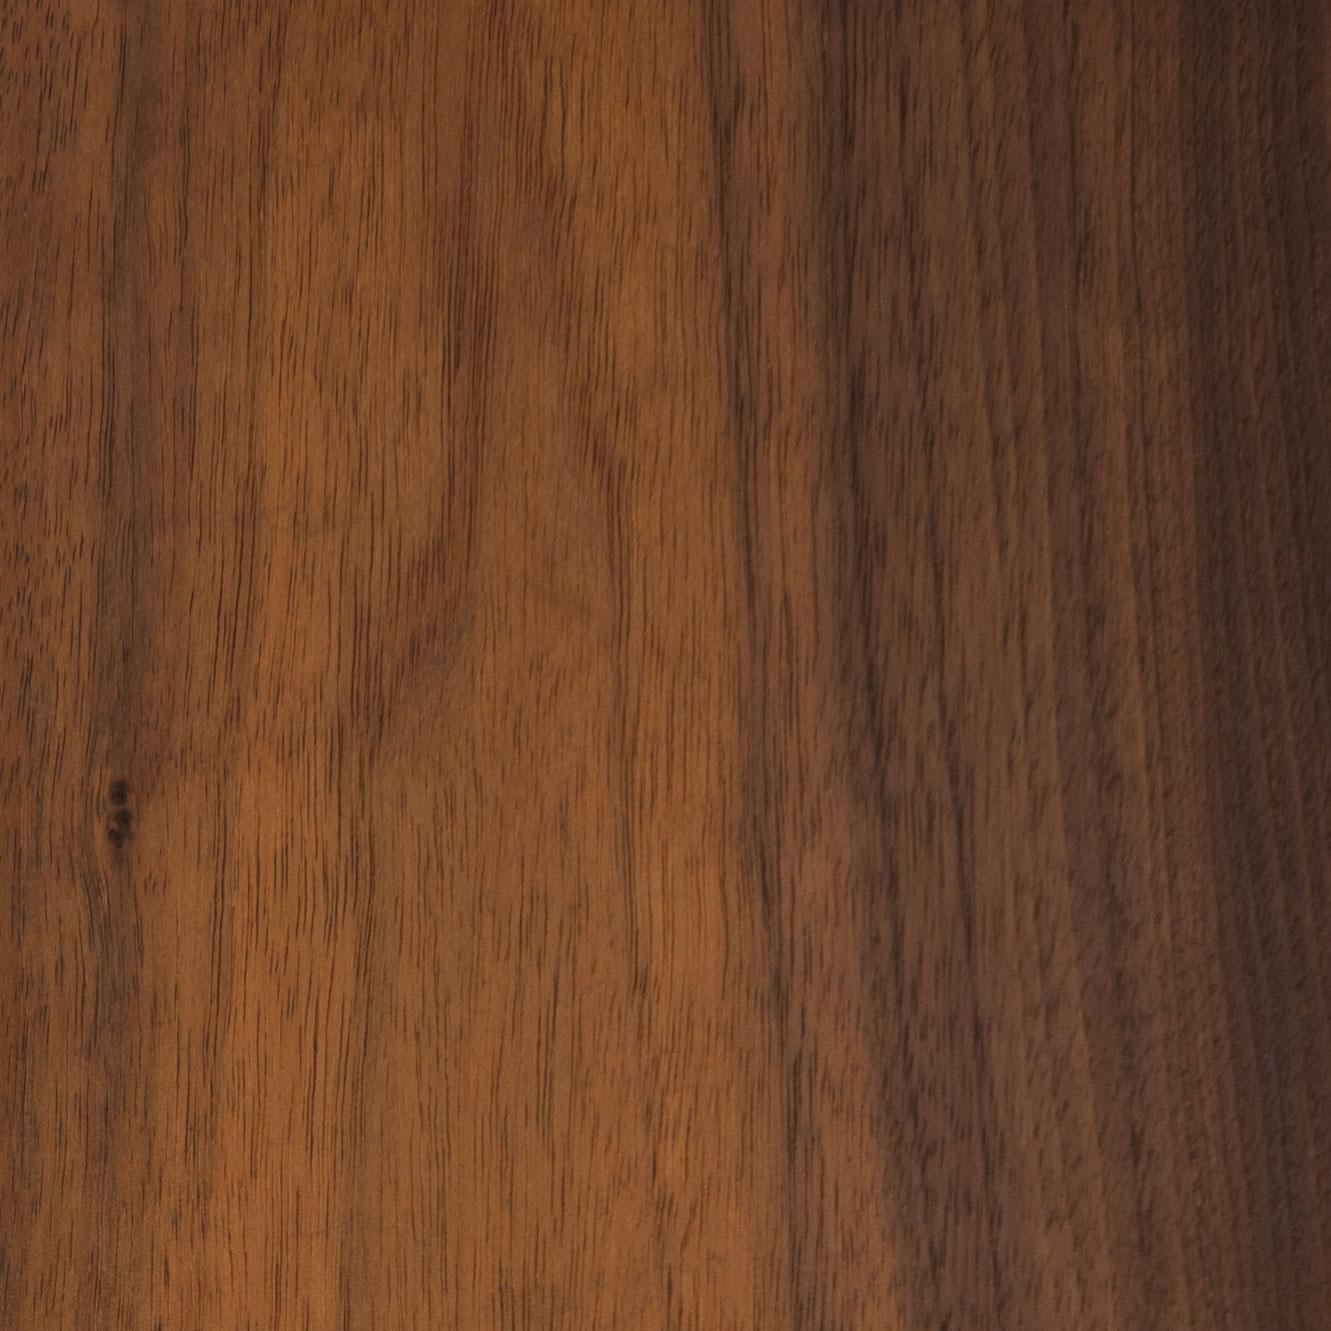 Element7-wide-plank-samples-european-walnut-IMG_9141_CMYK